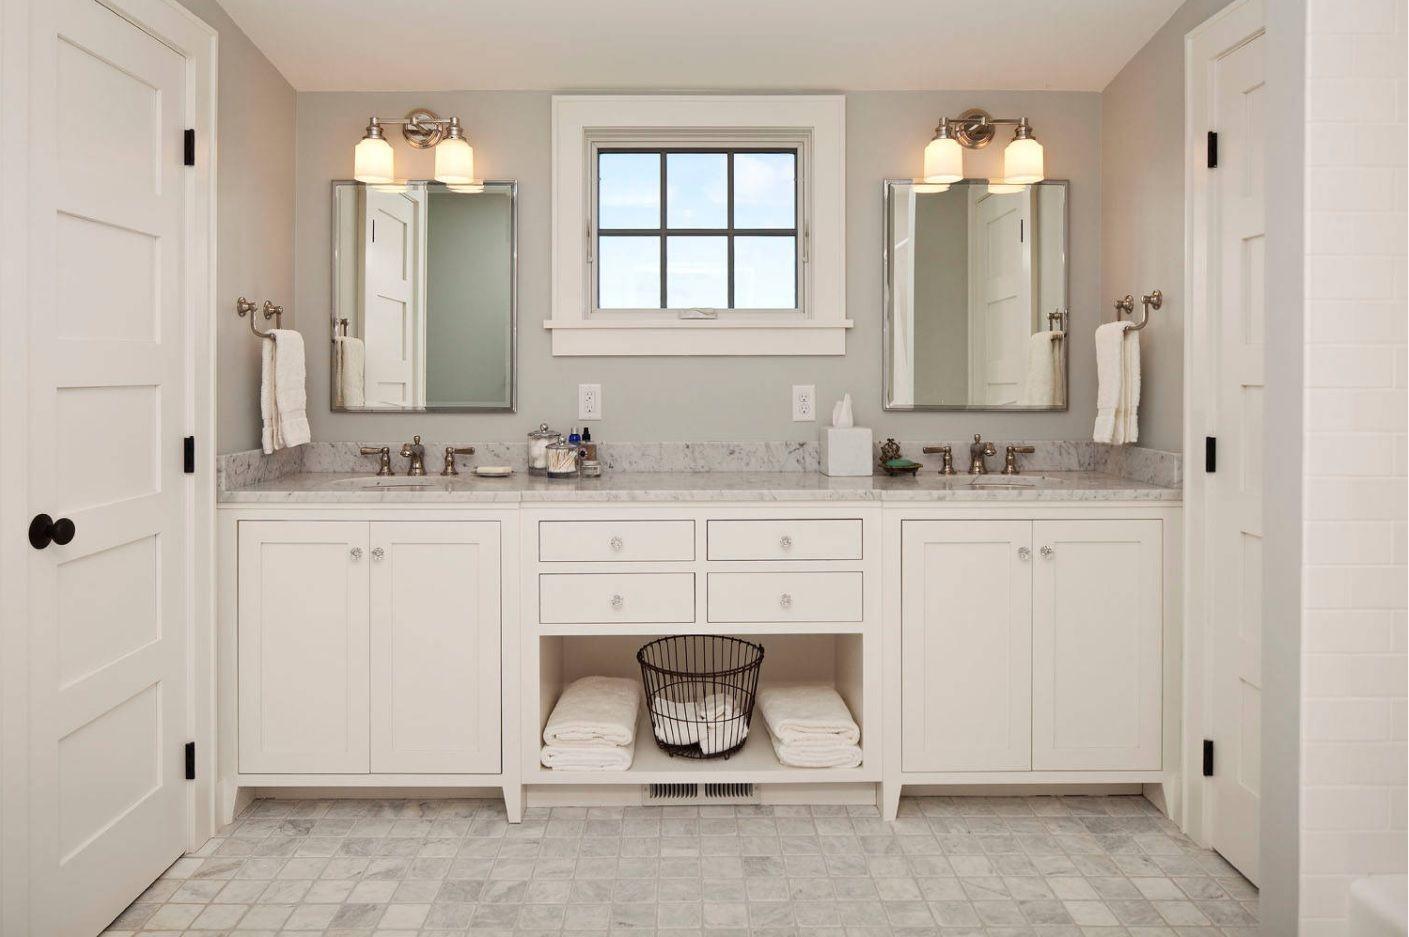 Jack And Jill Bathroom Interior Design Ideas Creamy White Color Scheme And The Monolith Vanity Jack And Jill Bathroom Bathroom Interior Design Bathroom Design